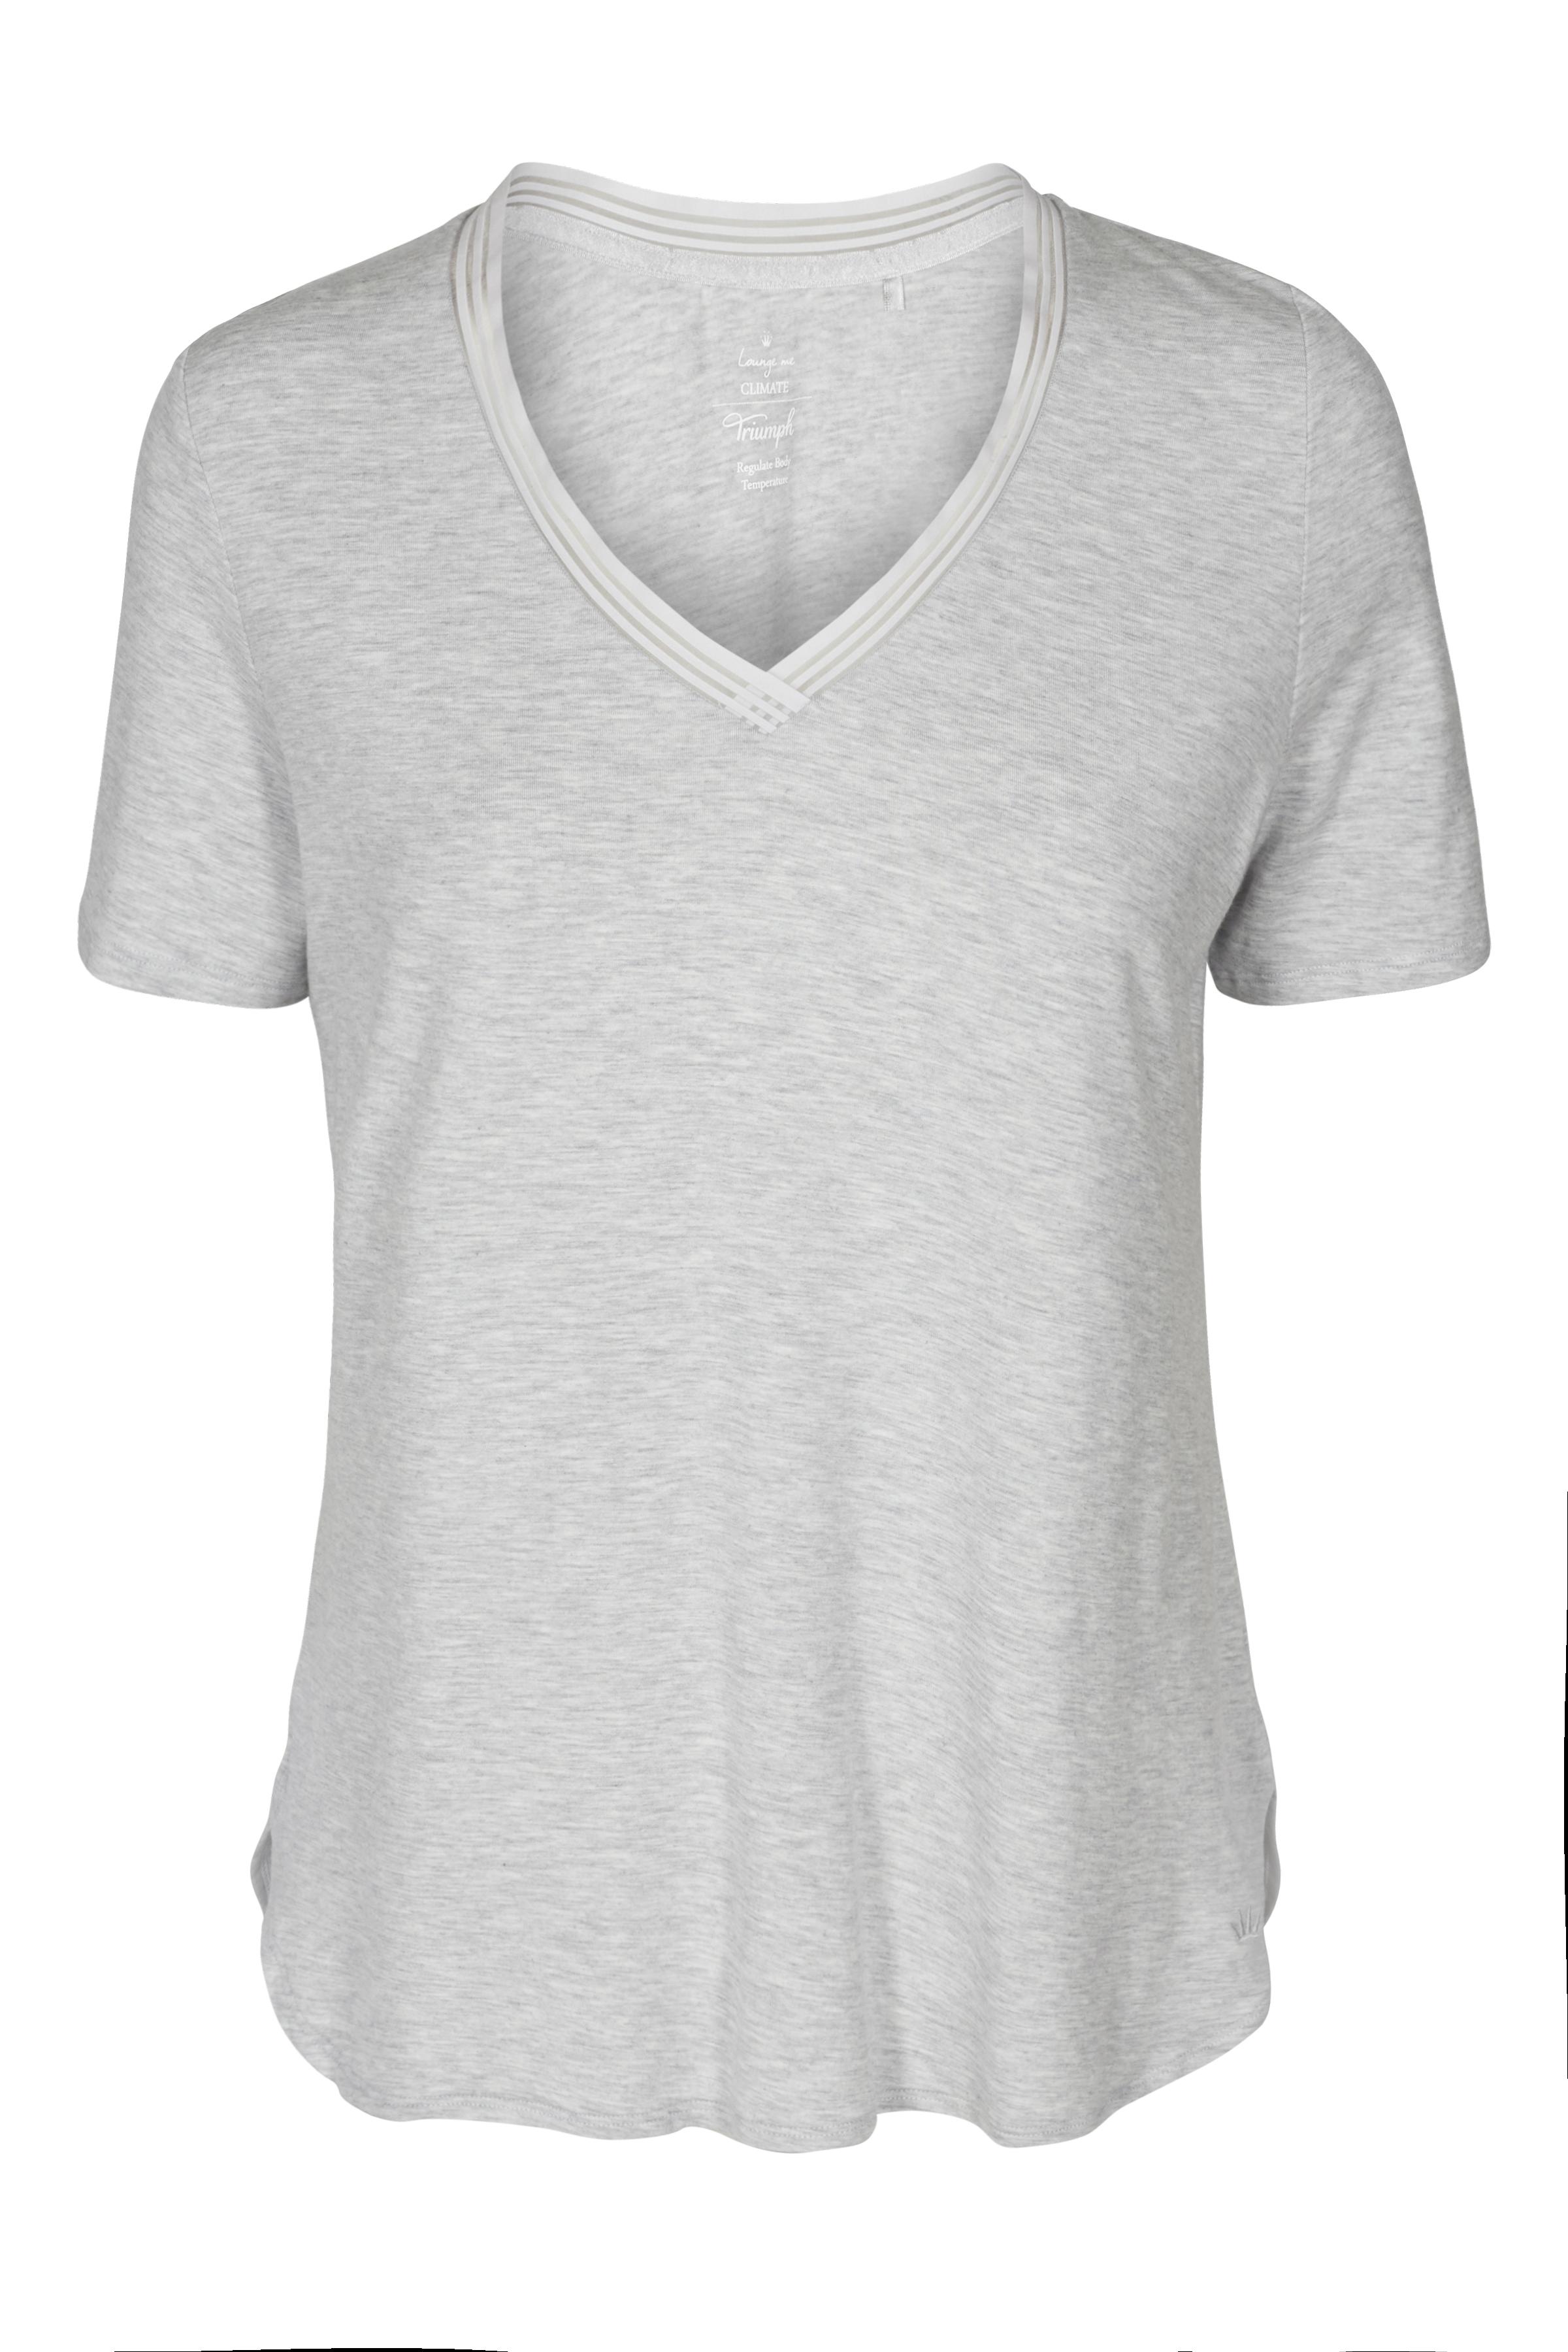 Image of Triumph Dame Homewear bluse - Climate Control - Gråmeleret